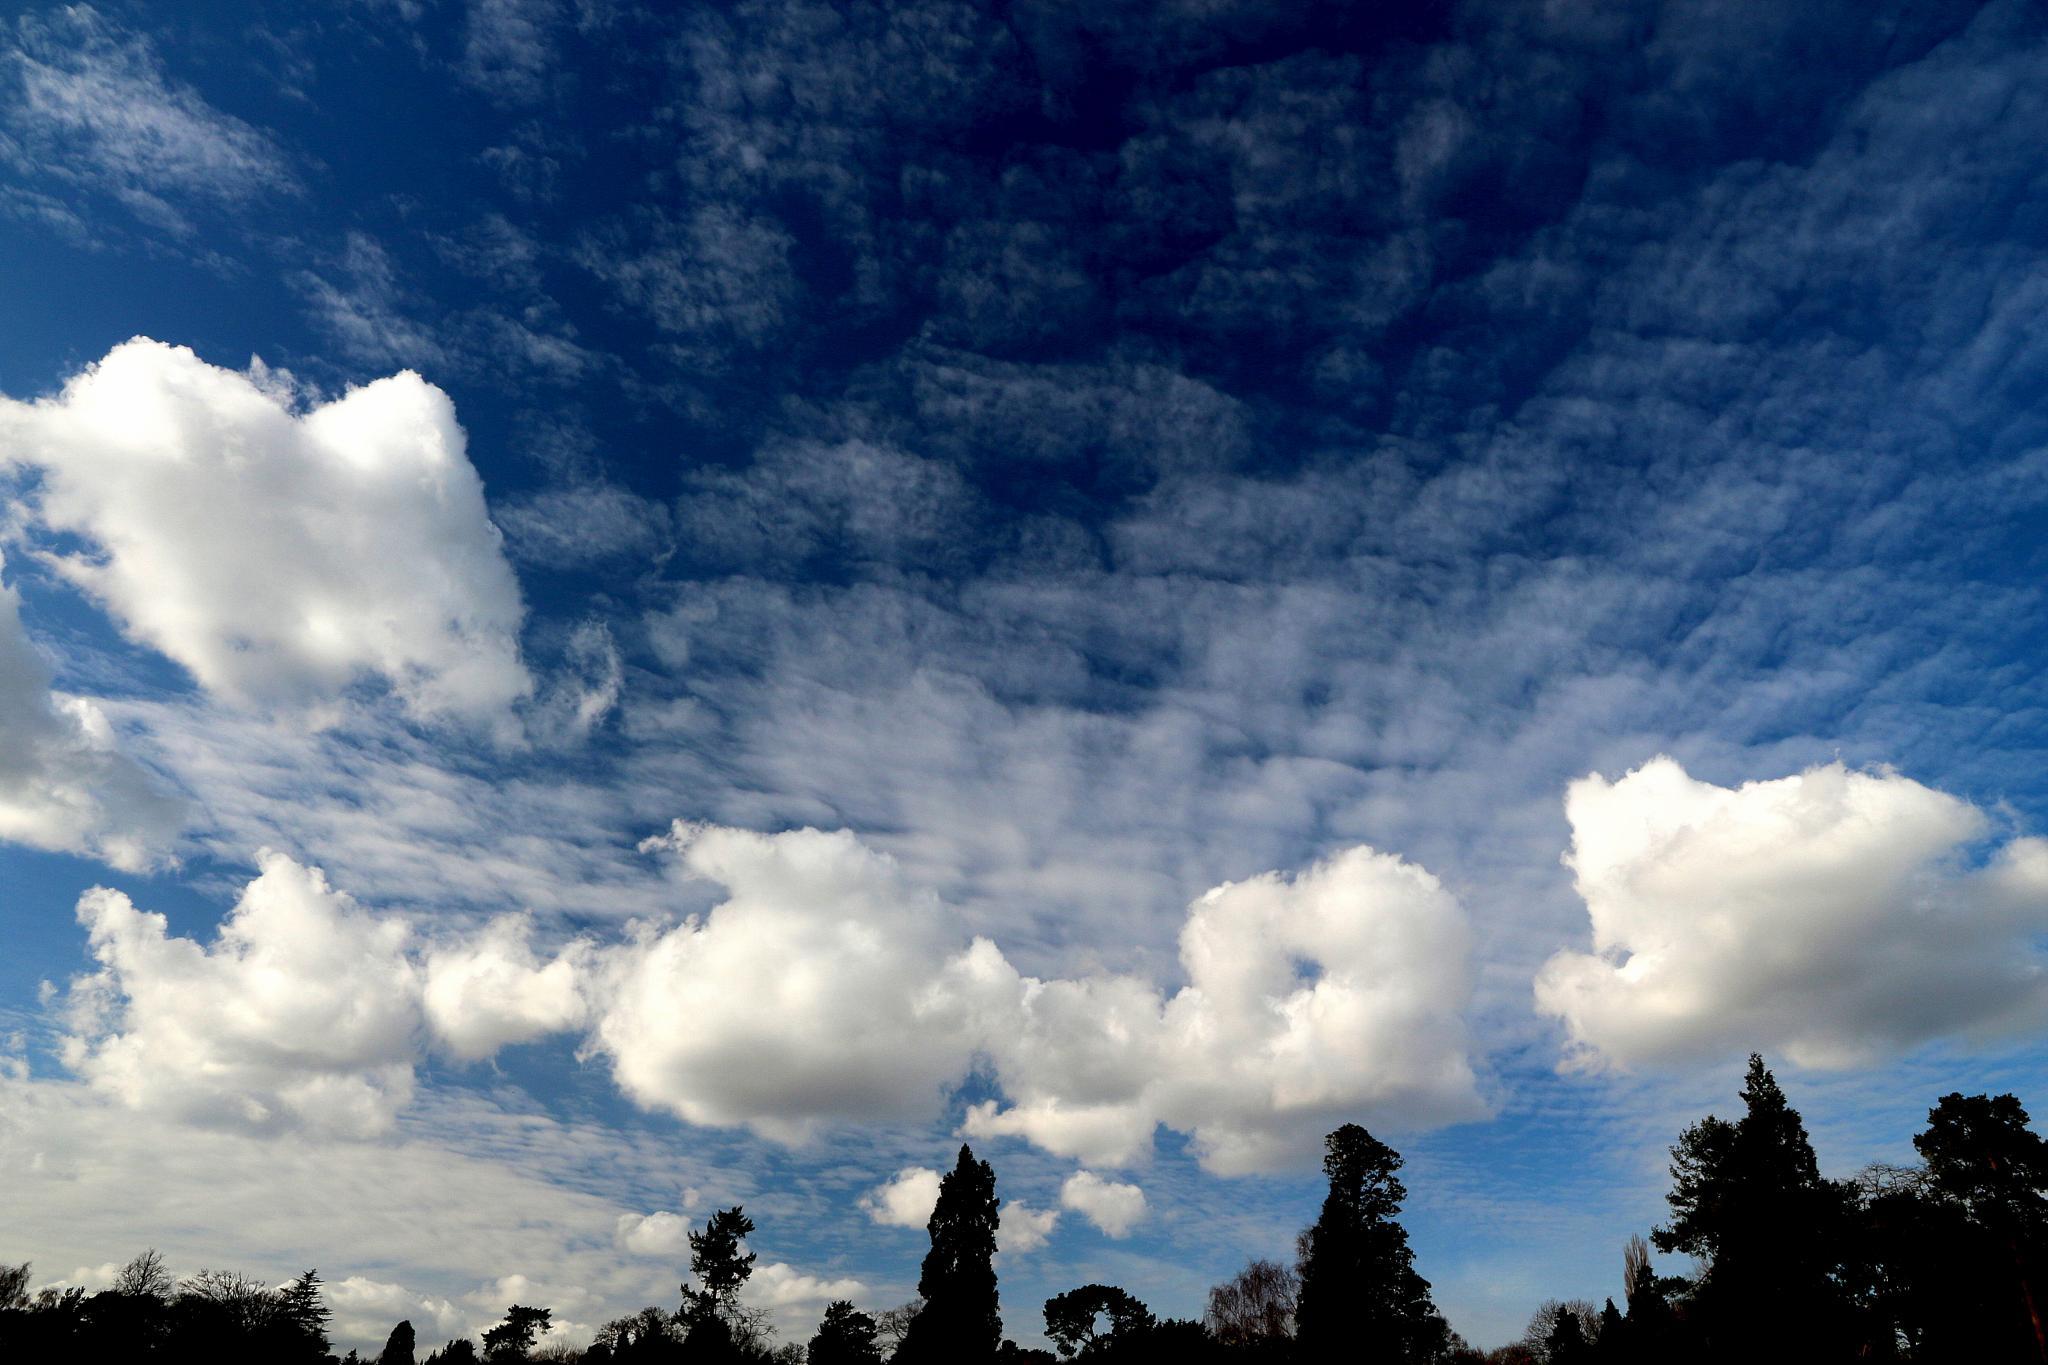 Cloudscape 2218 (A Meeting of Cumuli) by Jon Franks